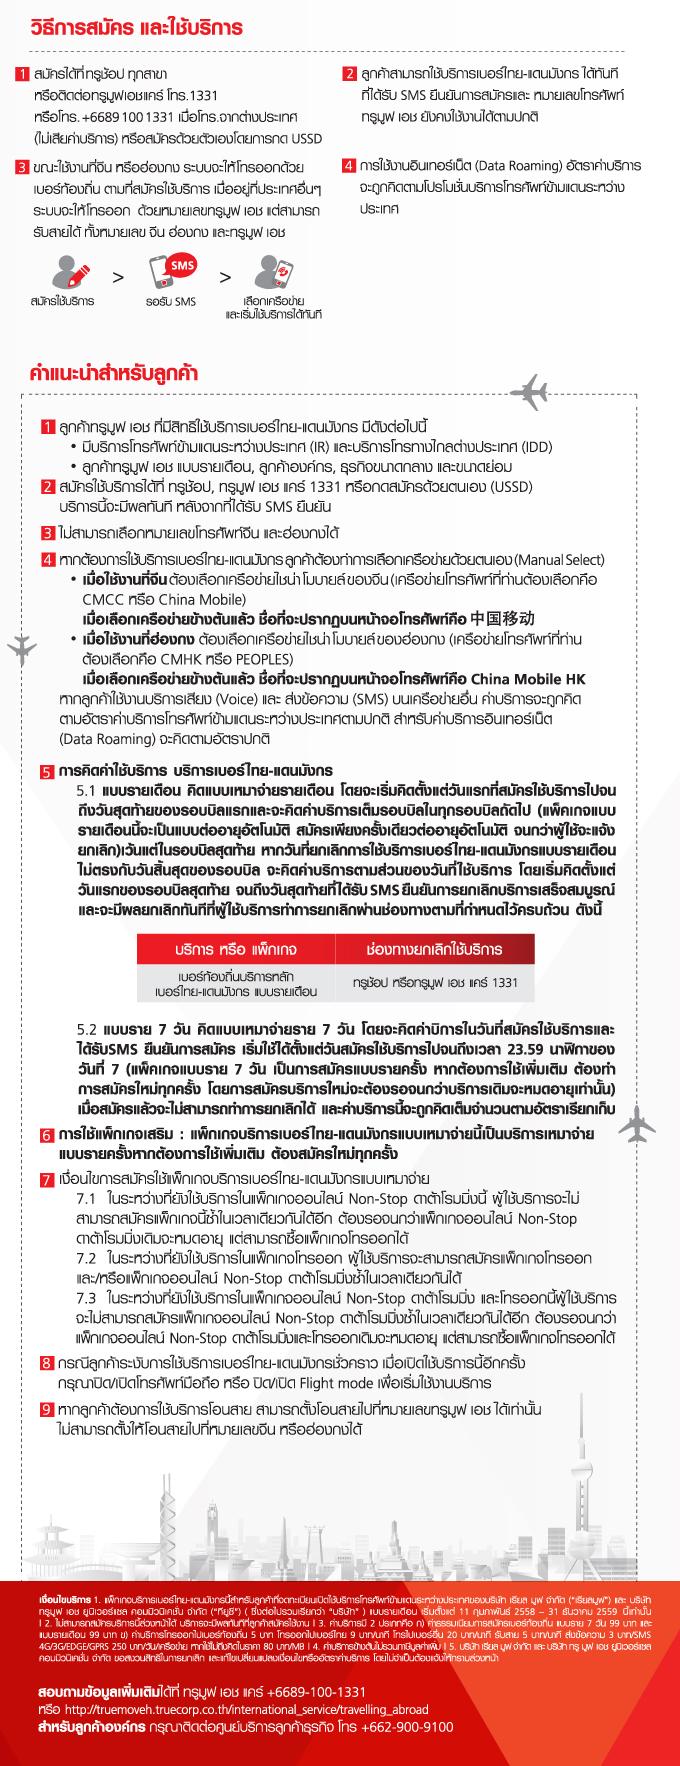 IR-Thai-GreatestChina-062816-th-03